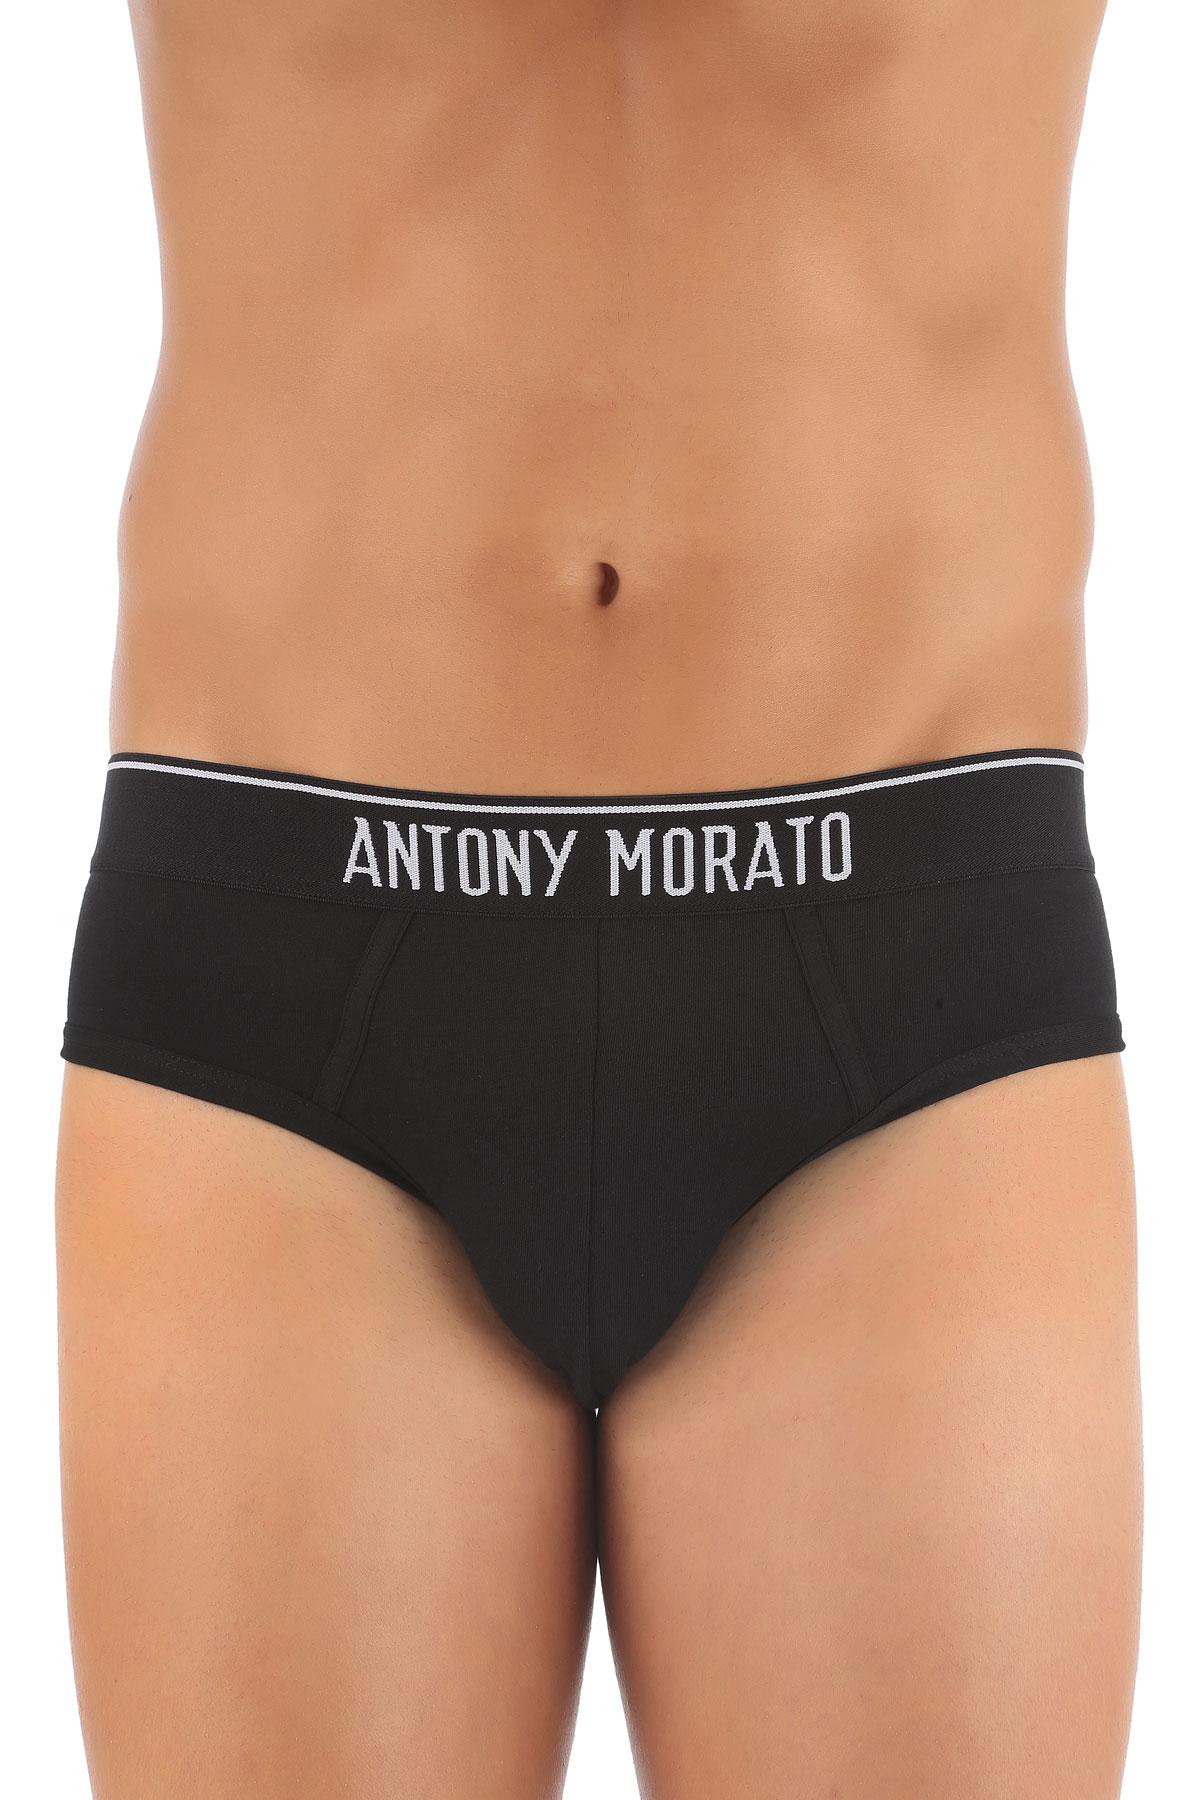 Antony Morato Slip Homme, Noir, Coton, 2017, L M S XL XXL